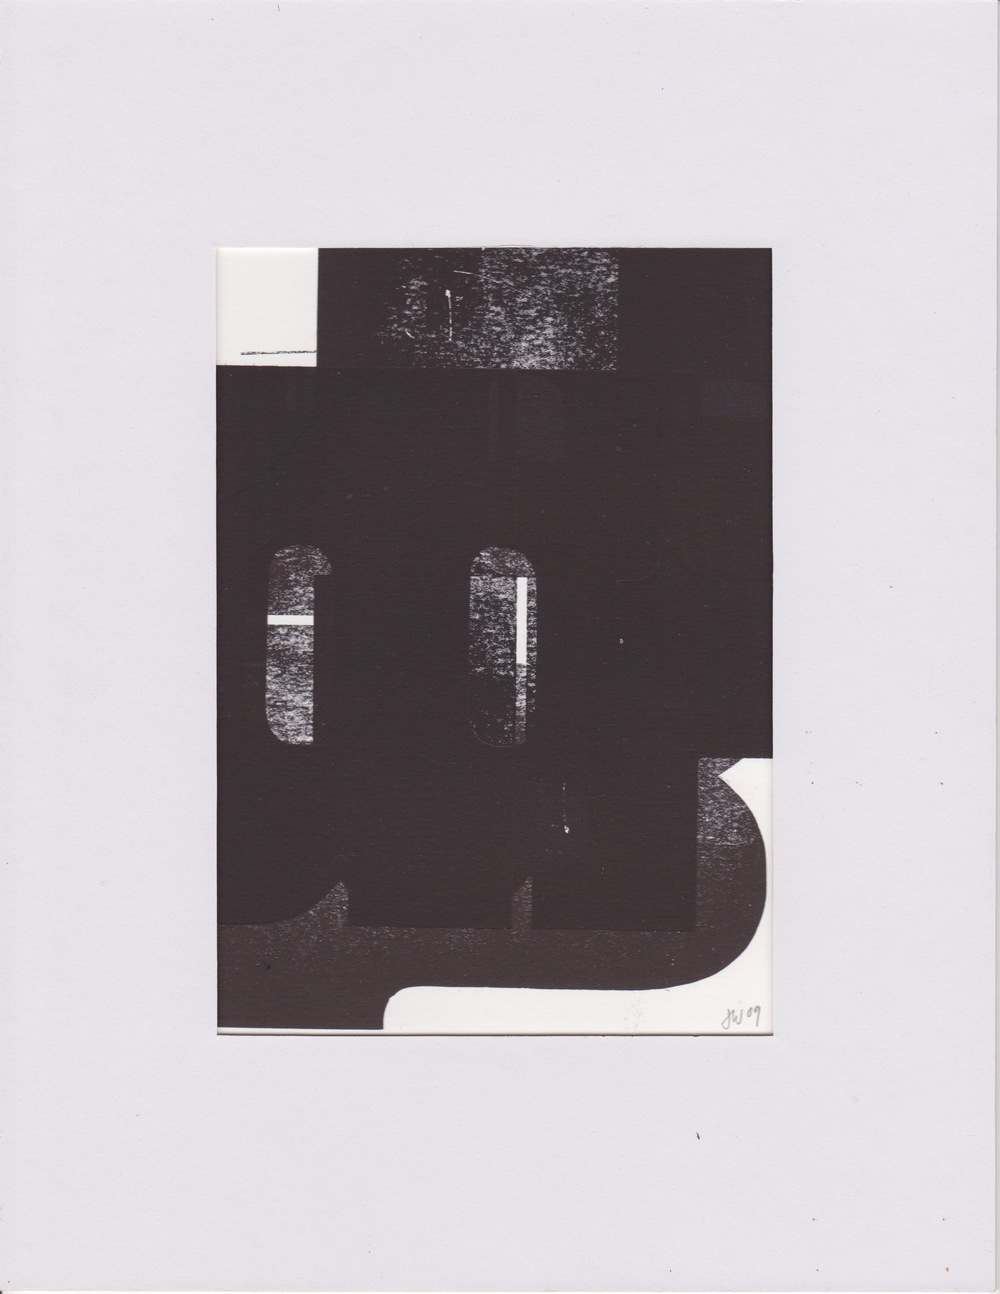 Woodtype Monotype 11